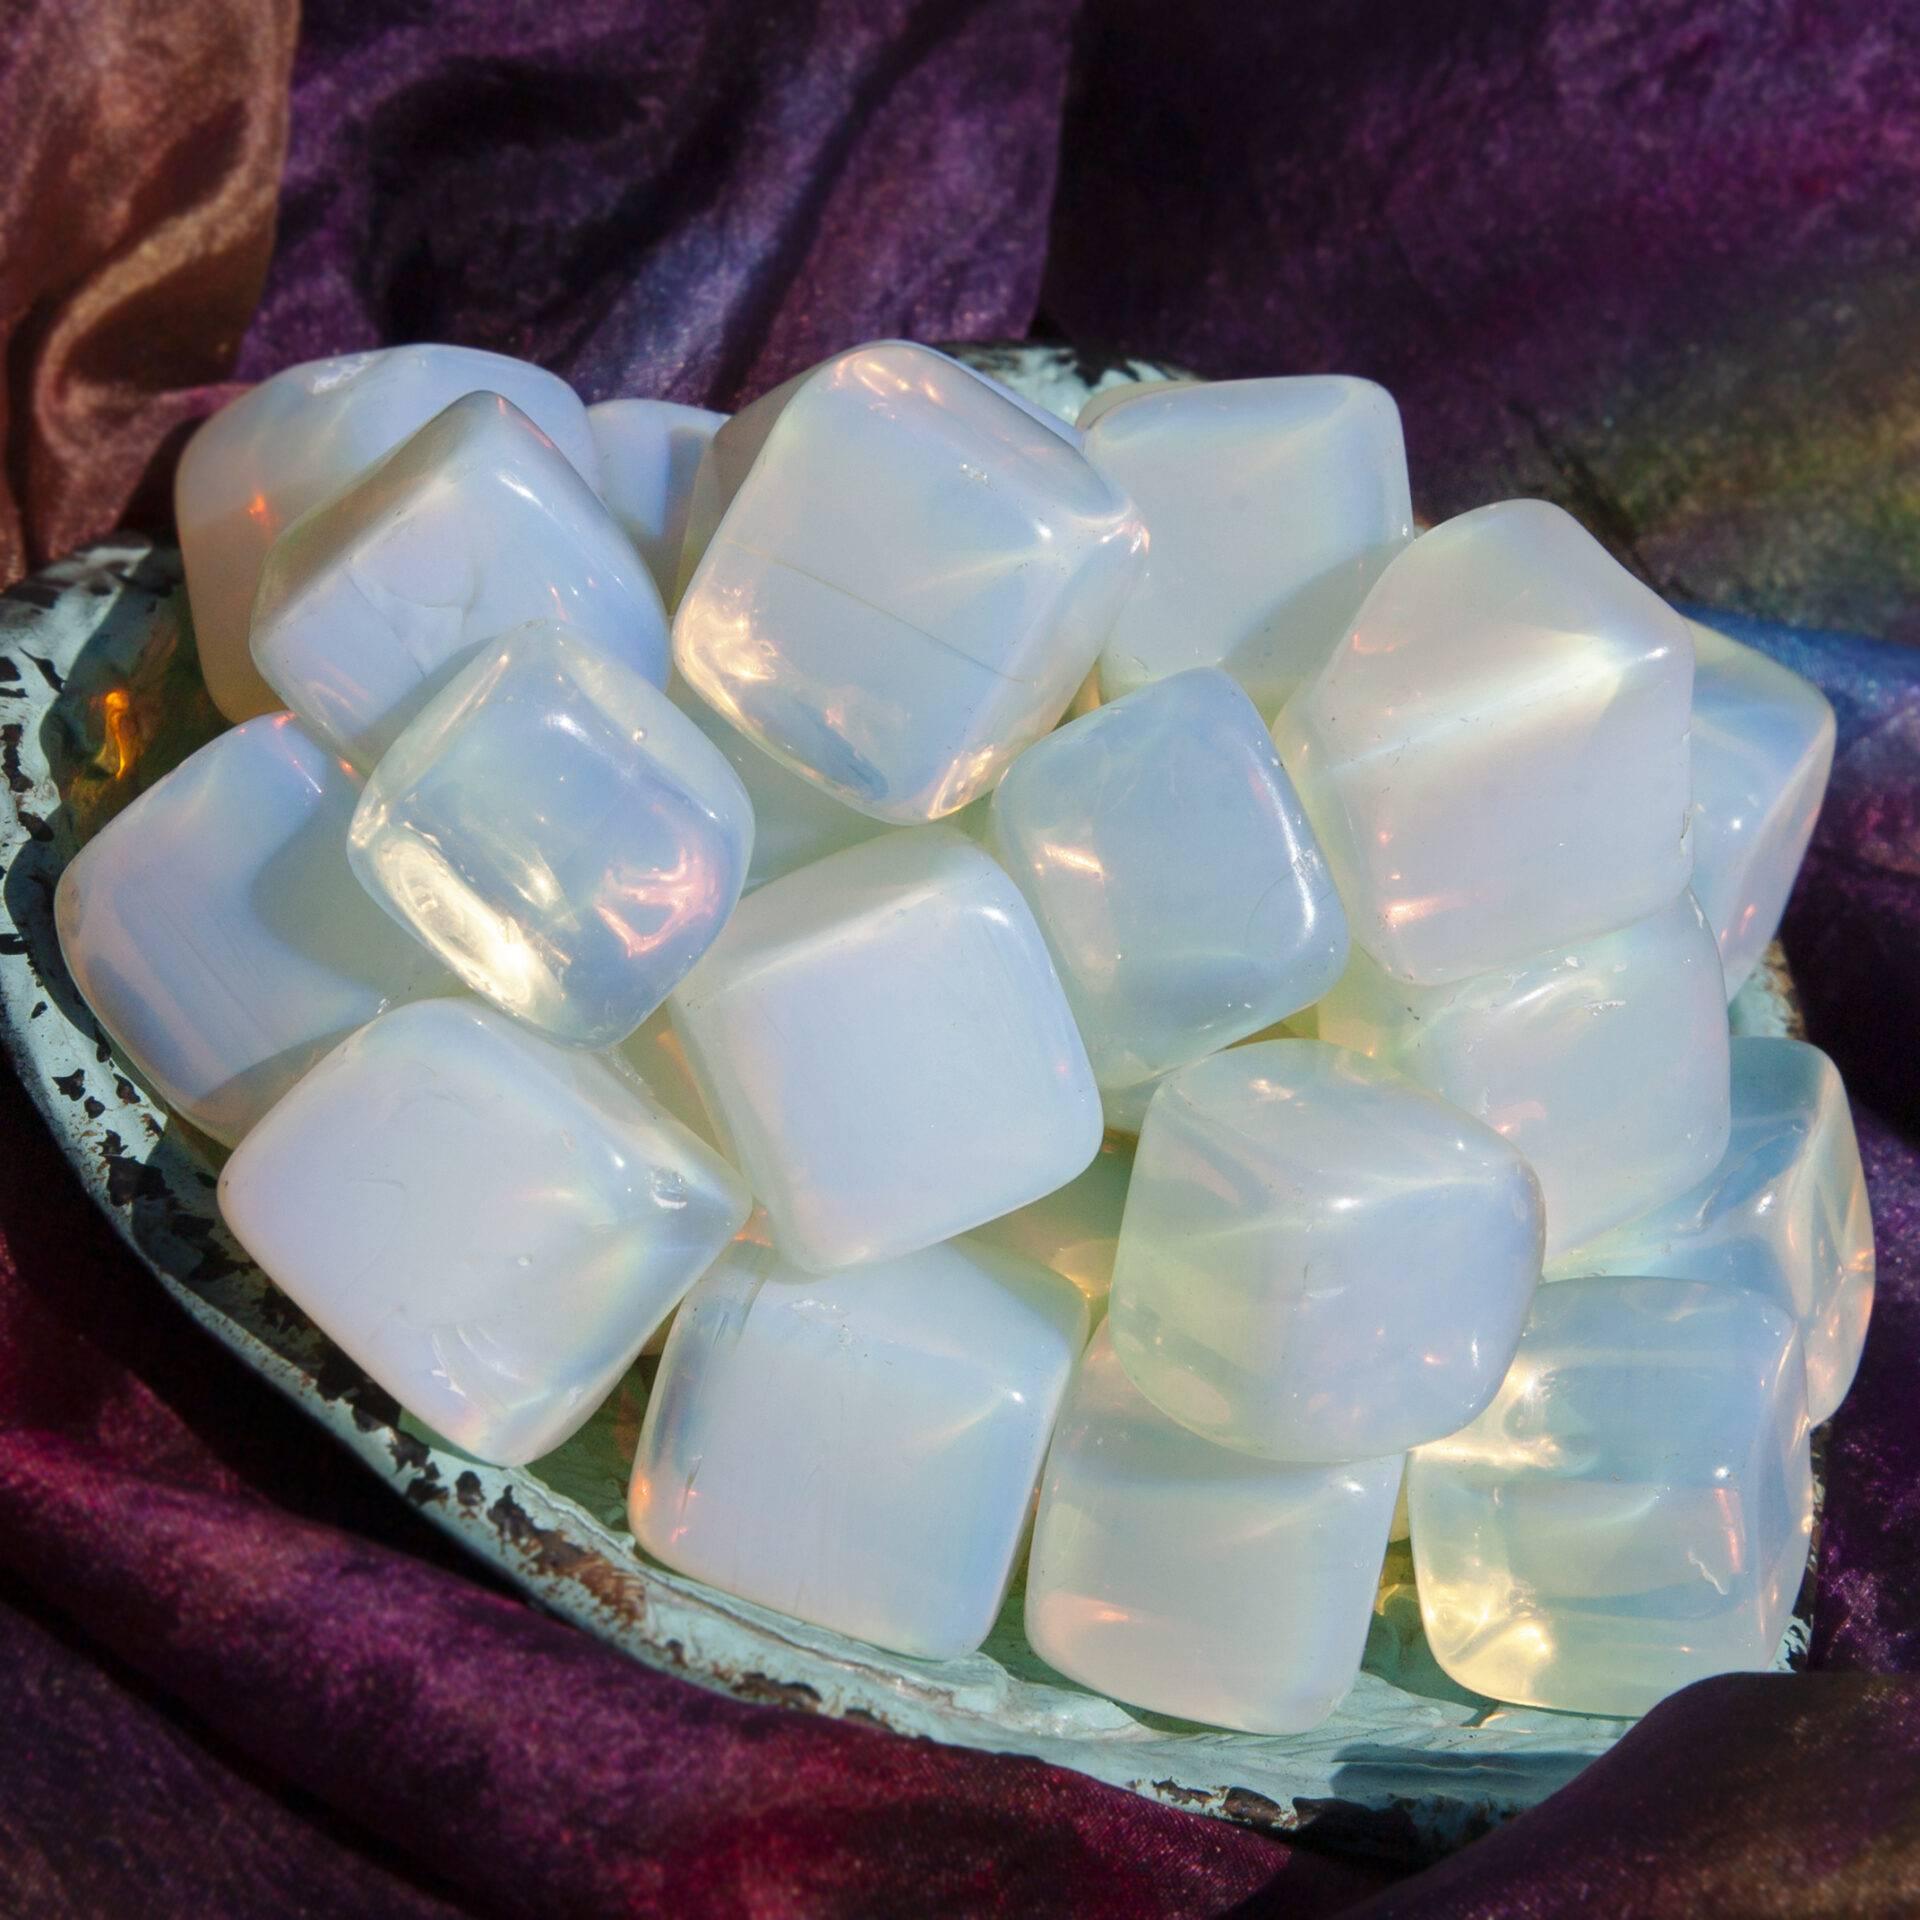 Opalite Gemstone Tumble Stone With Card rd9